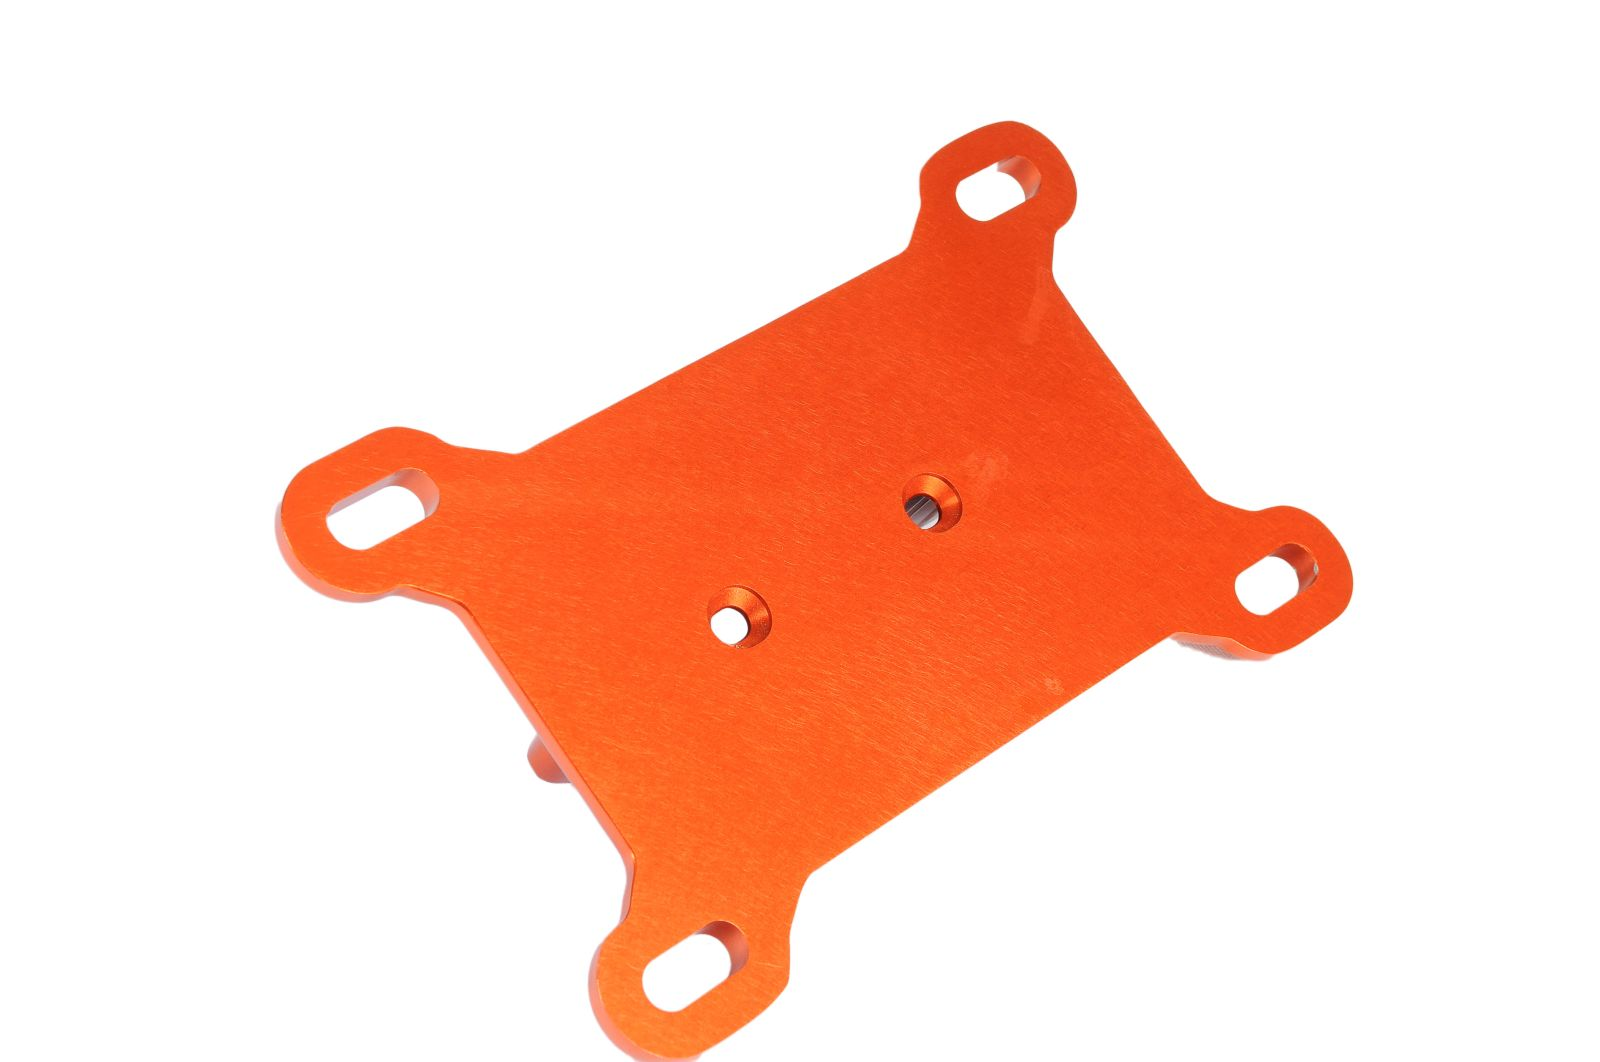 Kitefoil box kfbox tuttle probox plate aluminium access 5 0 3786 1